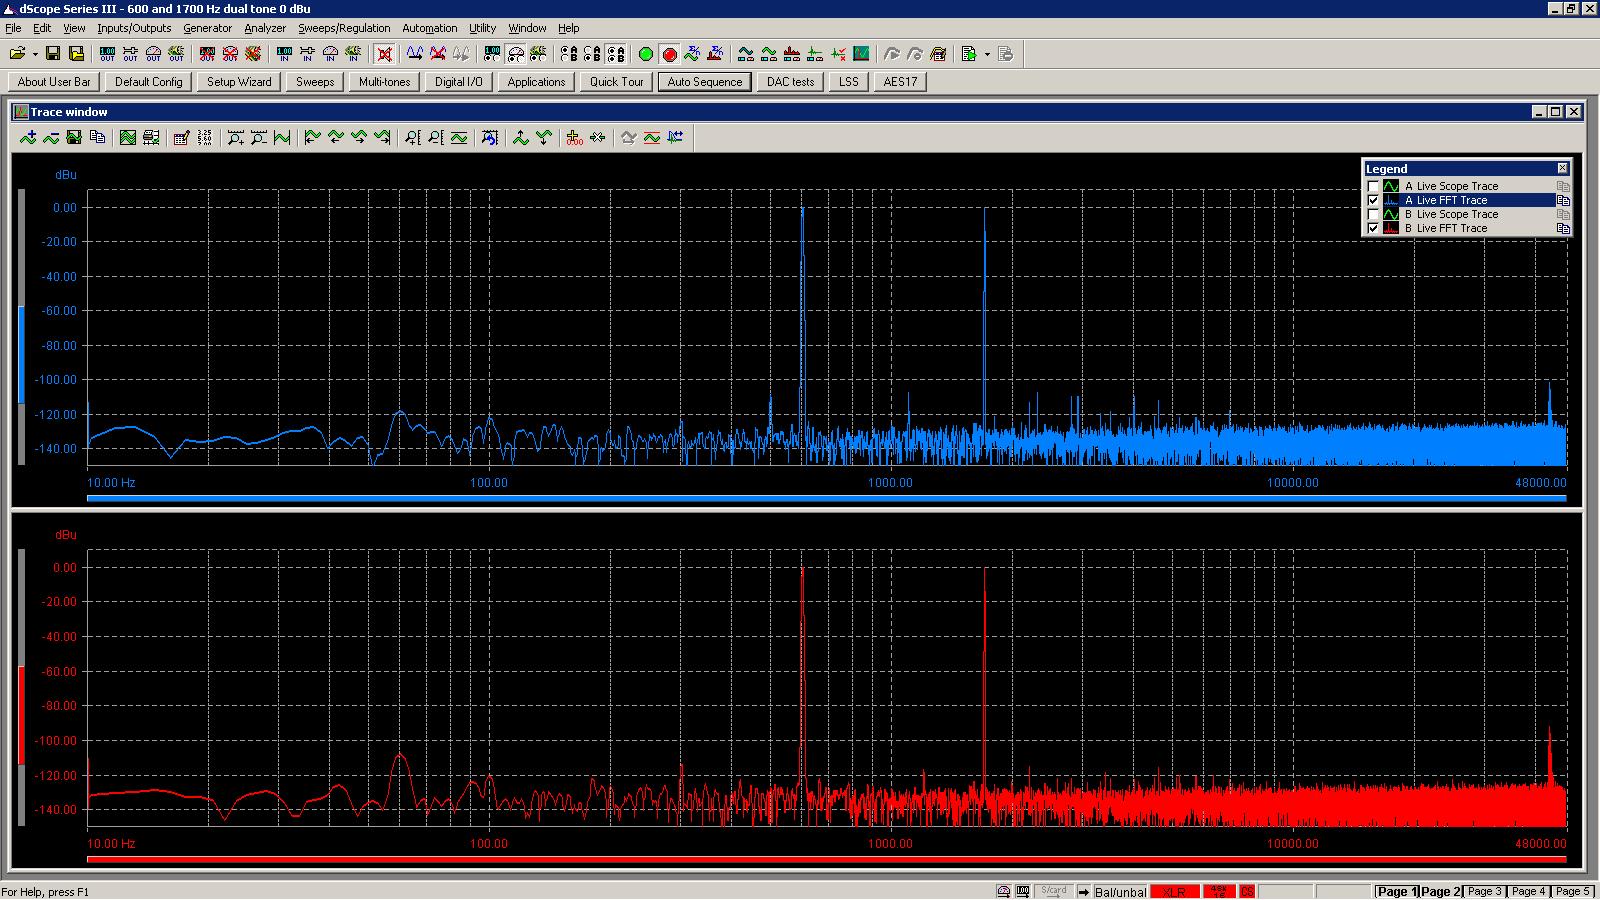 20160905 Jotunheim 600+1700Hz dual tone 0dBu 300R Bal.png